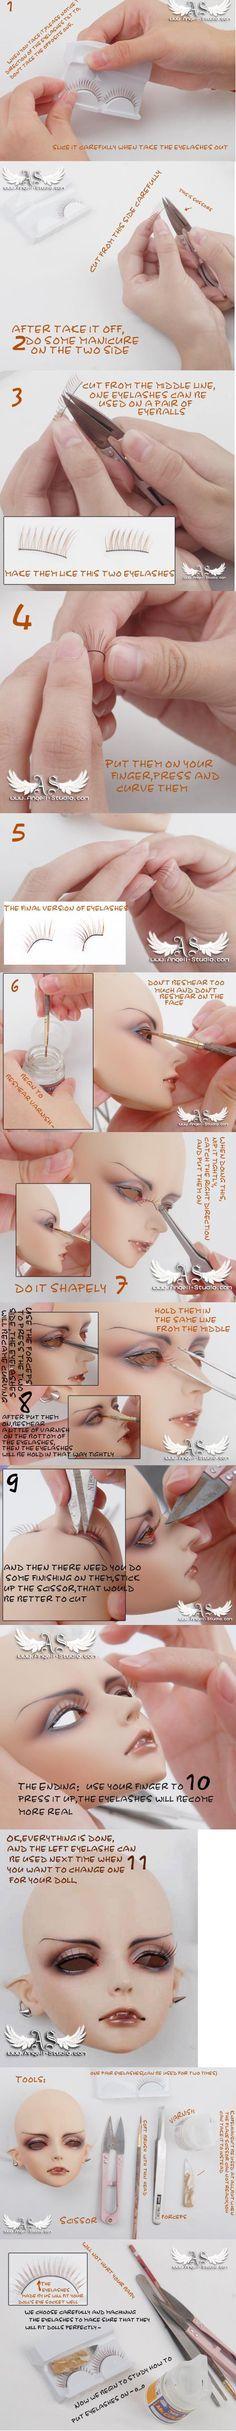 Eyelashes Attaching for dolls by Angell-studio.deviantart.com on @deviantART